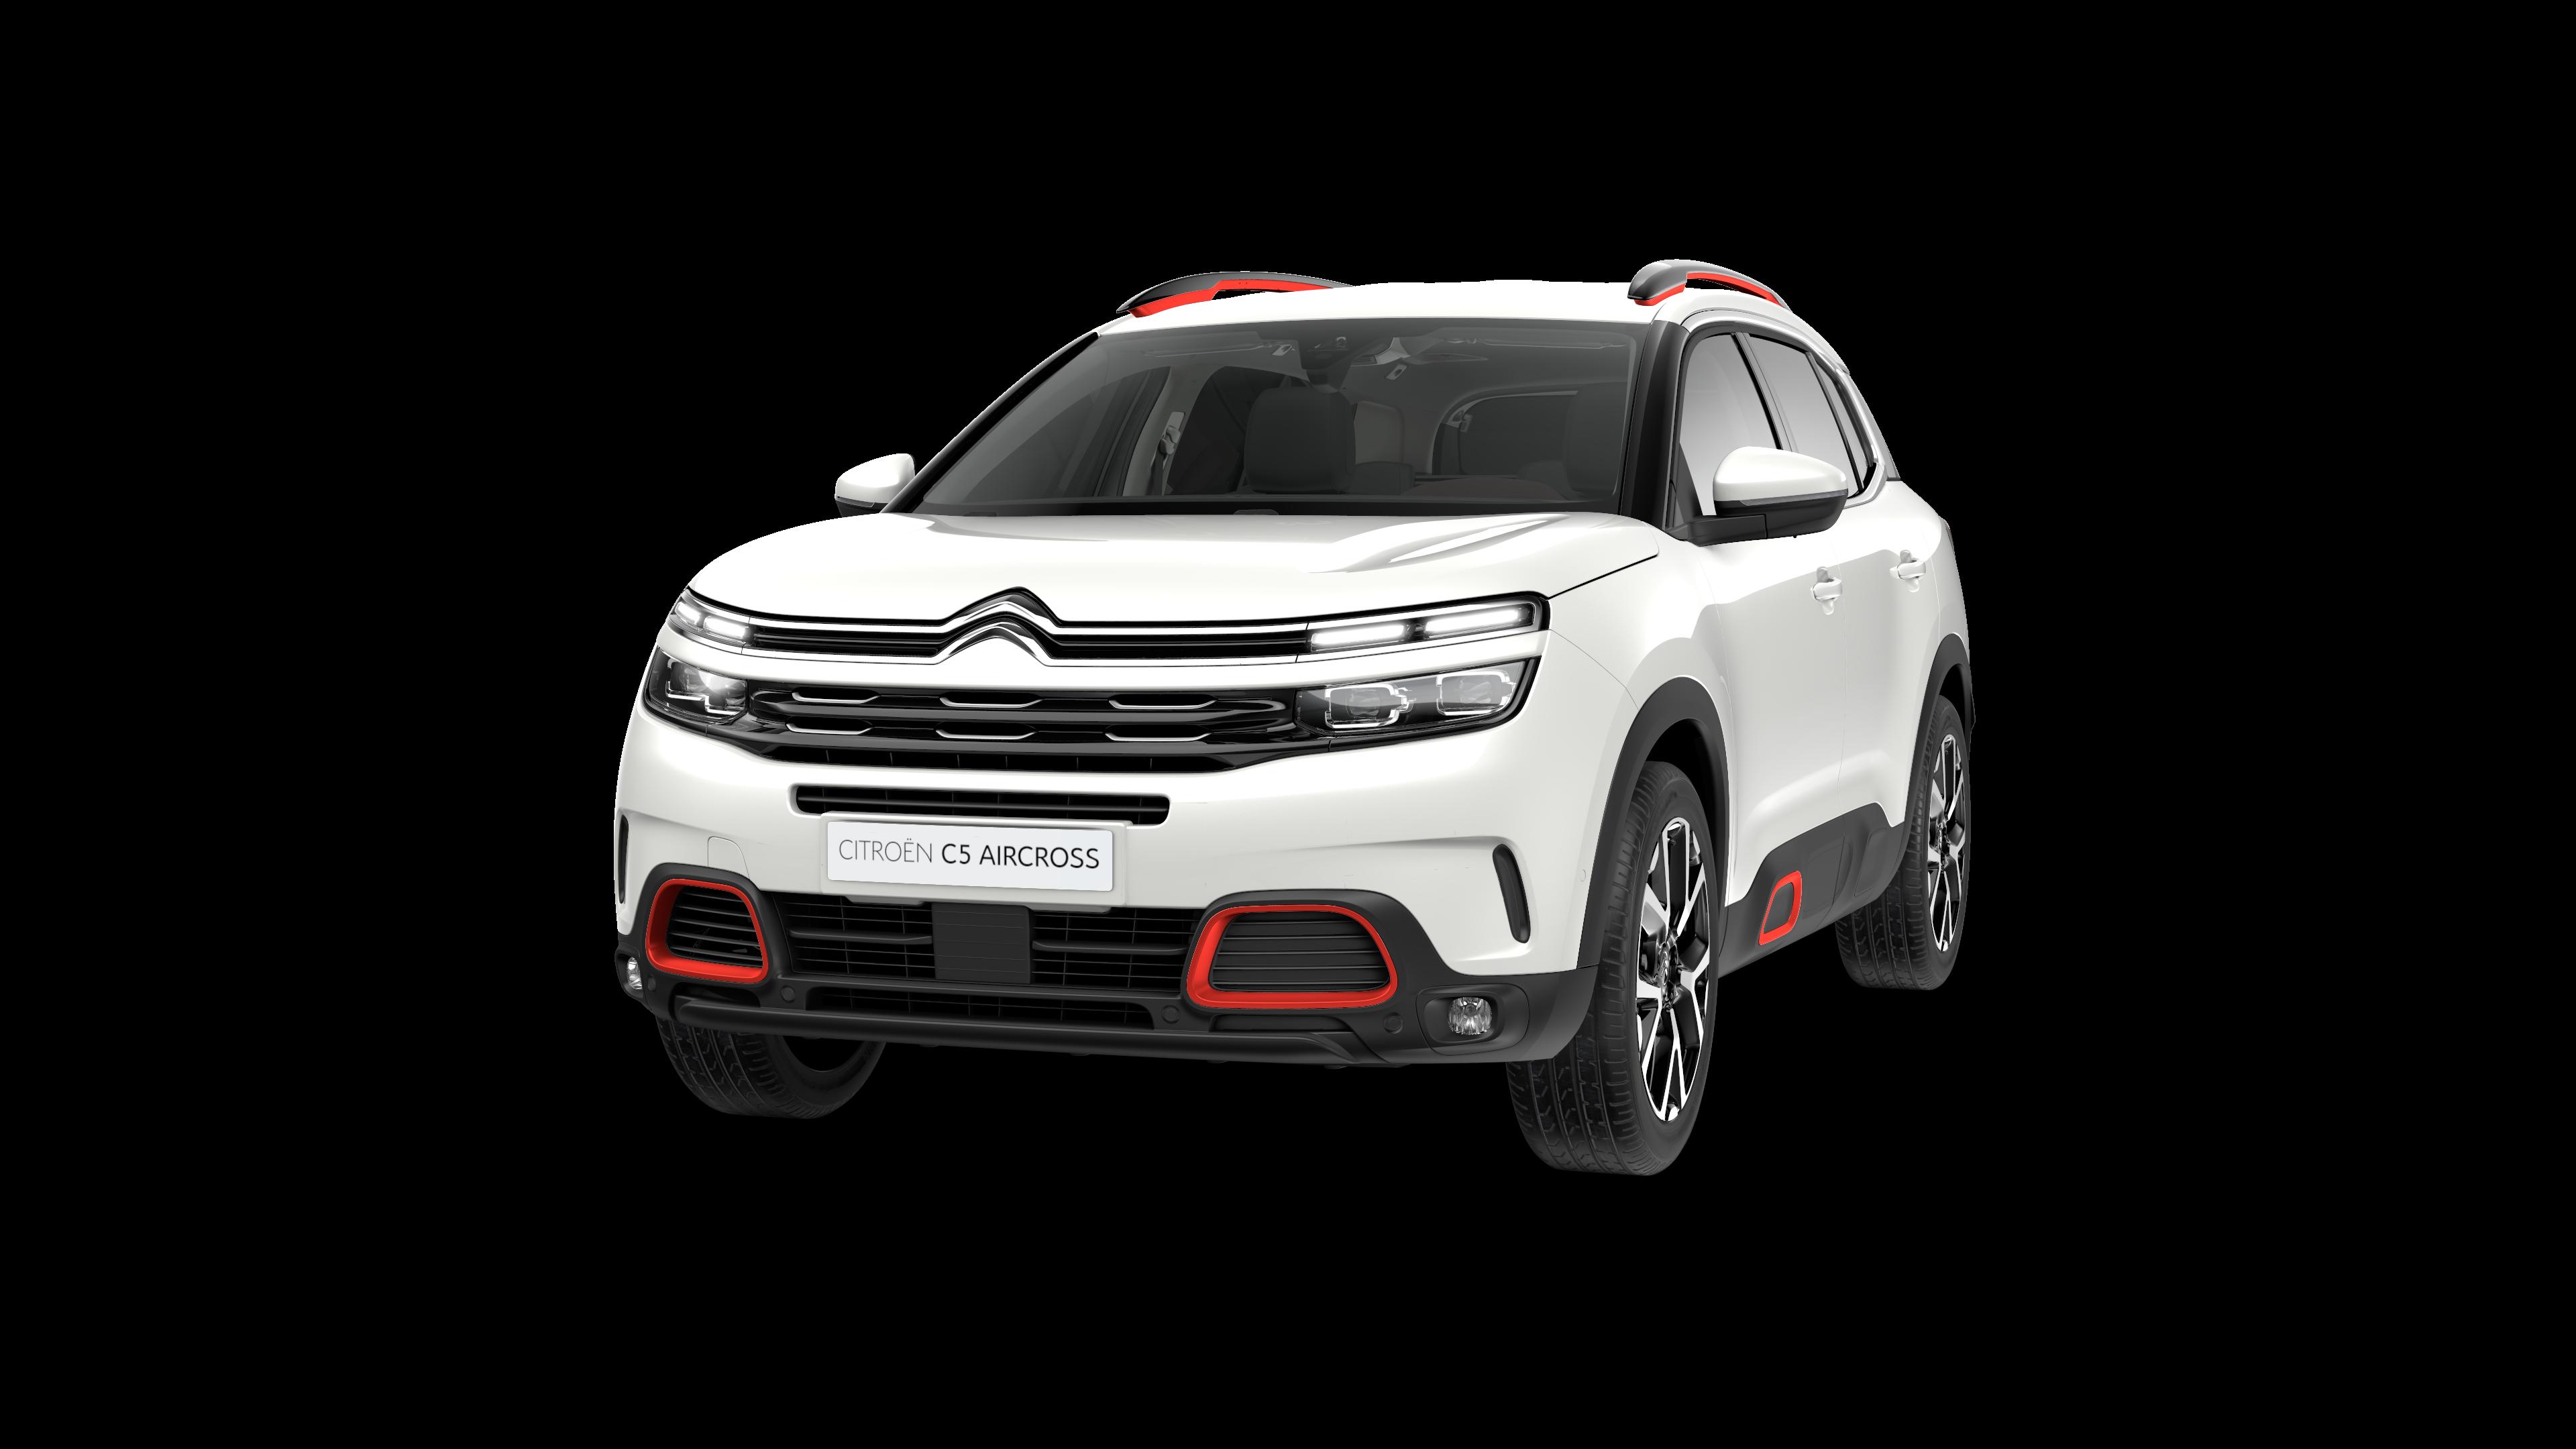 Citroën SUV C5 Aircross en blanc nacré